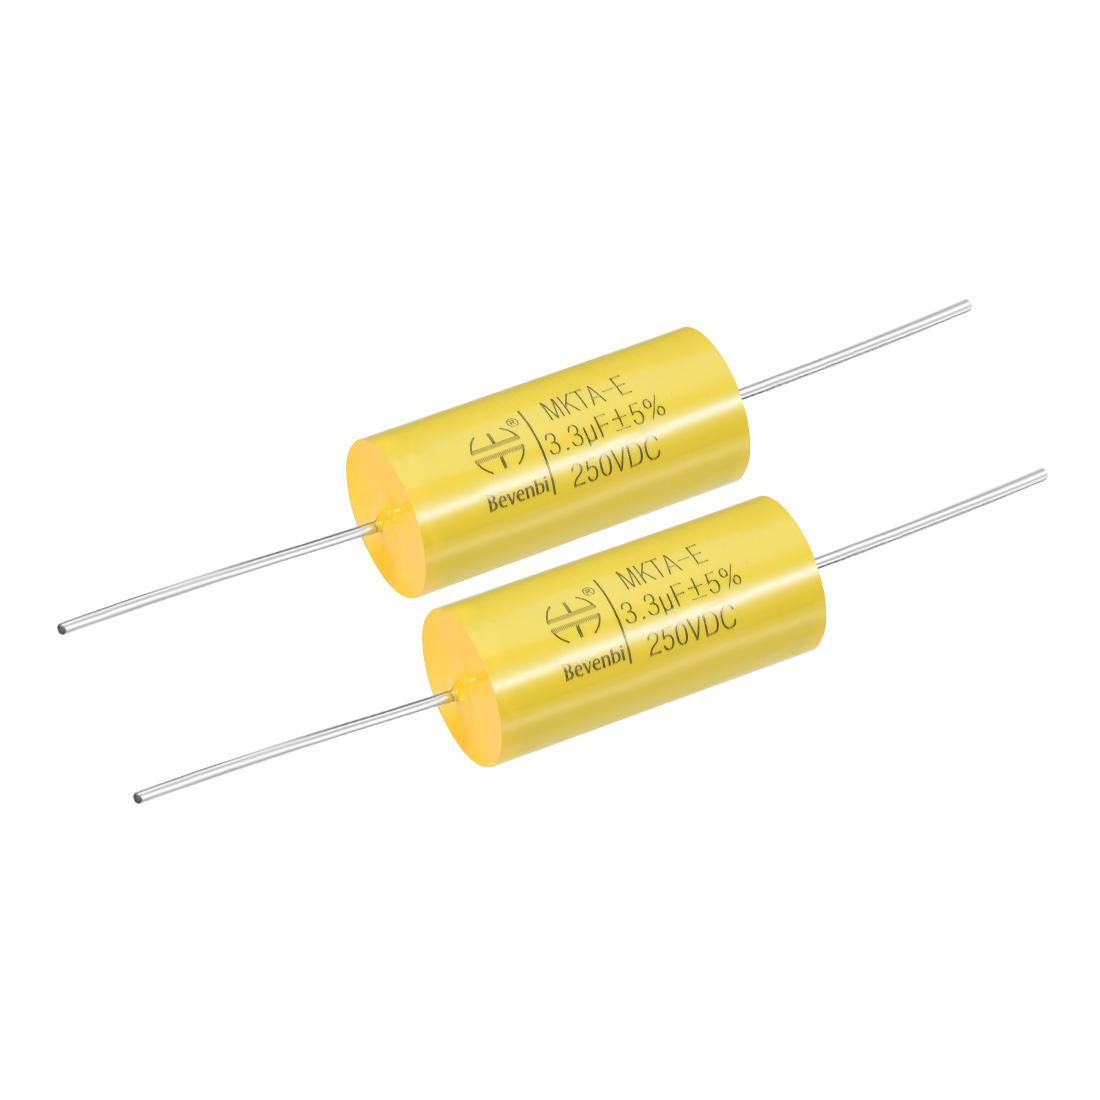 Film Capacitor 250V DC 3.3uF MKTA-E Round Polypropylene Capacitors Yellow 2pcs